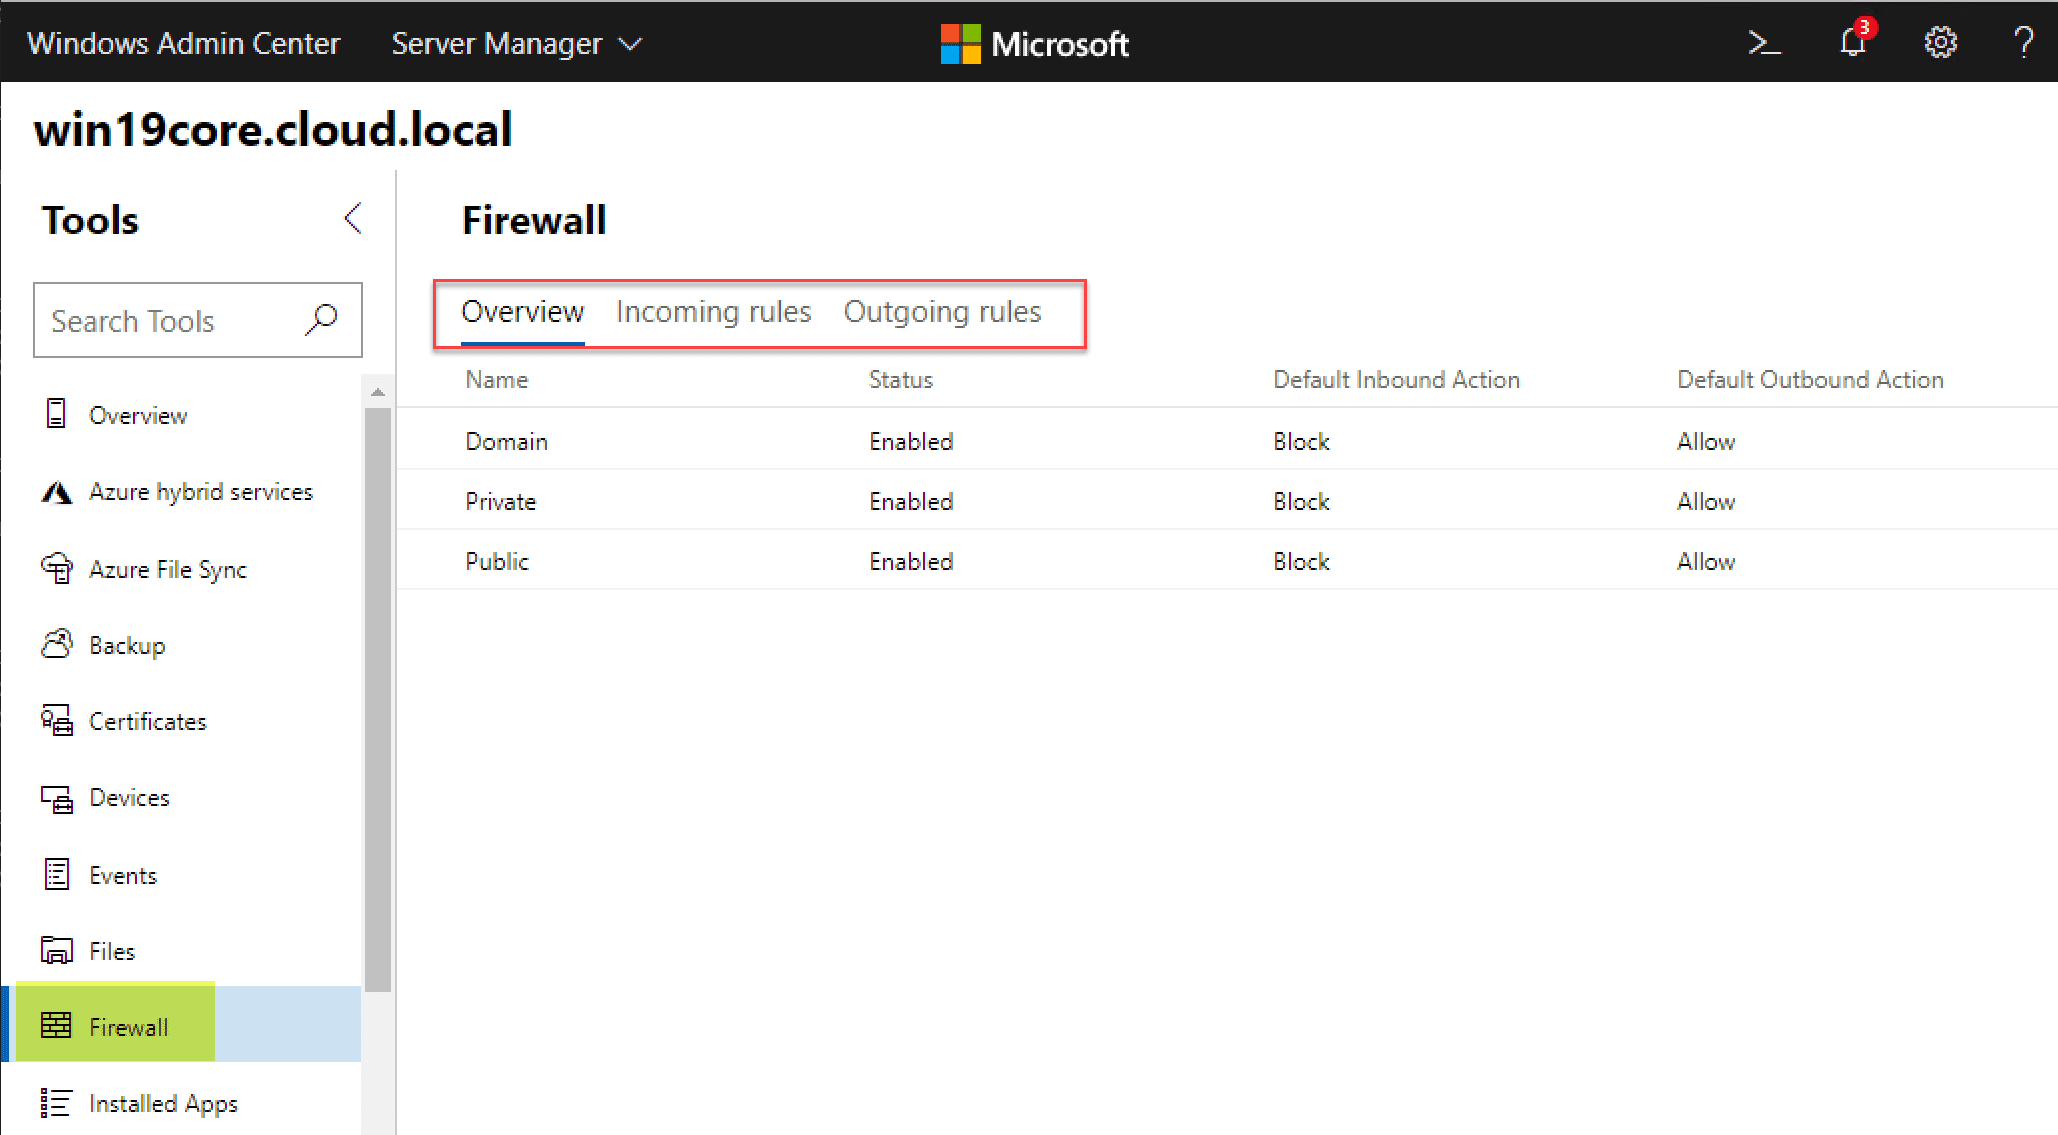 Managing-firewall-settings-remotely-using-Windows-Admin-Center